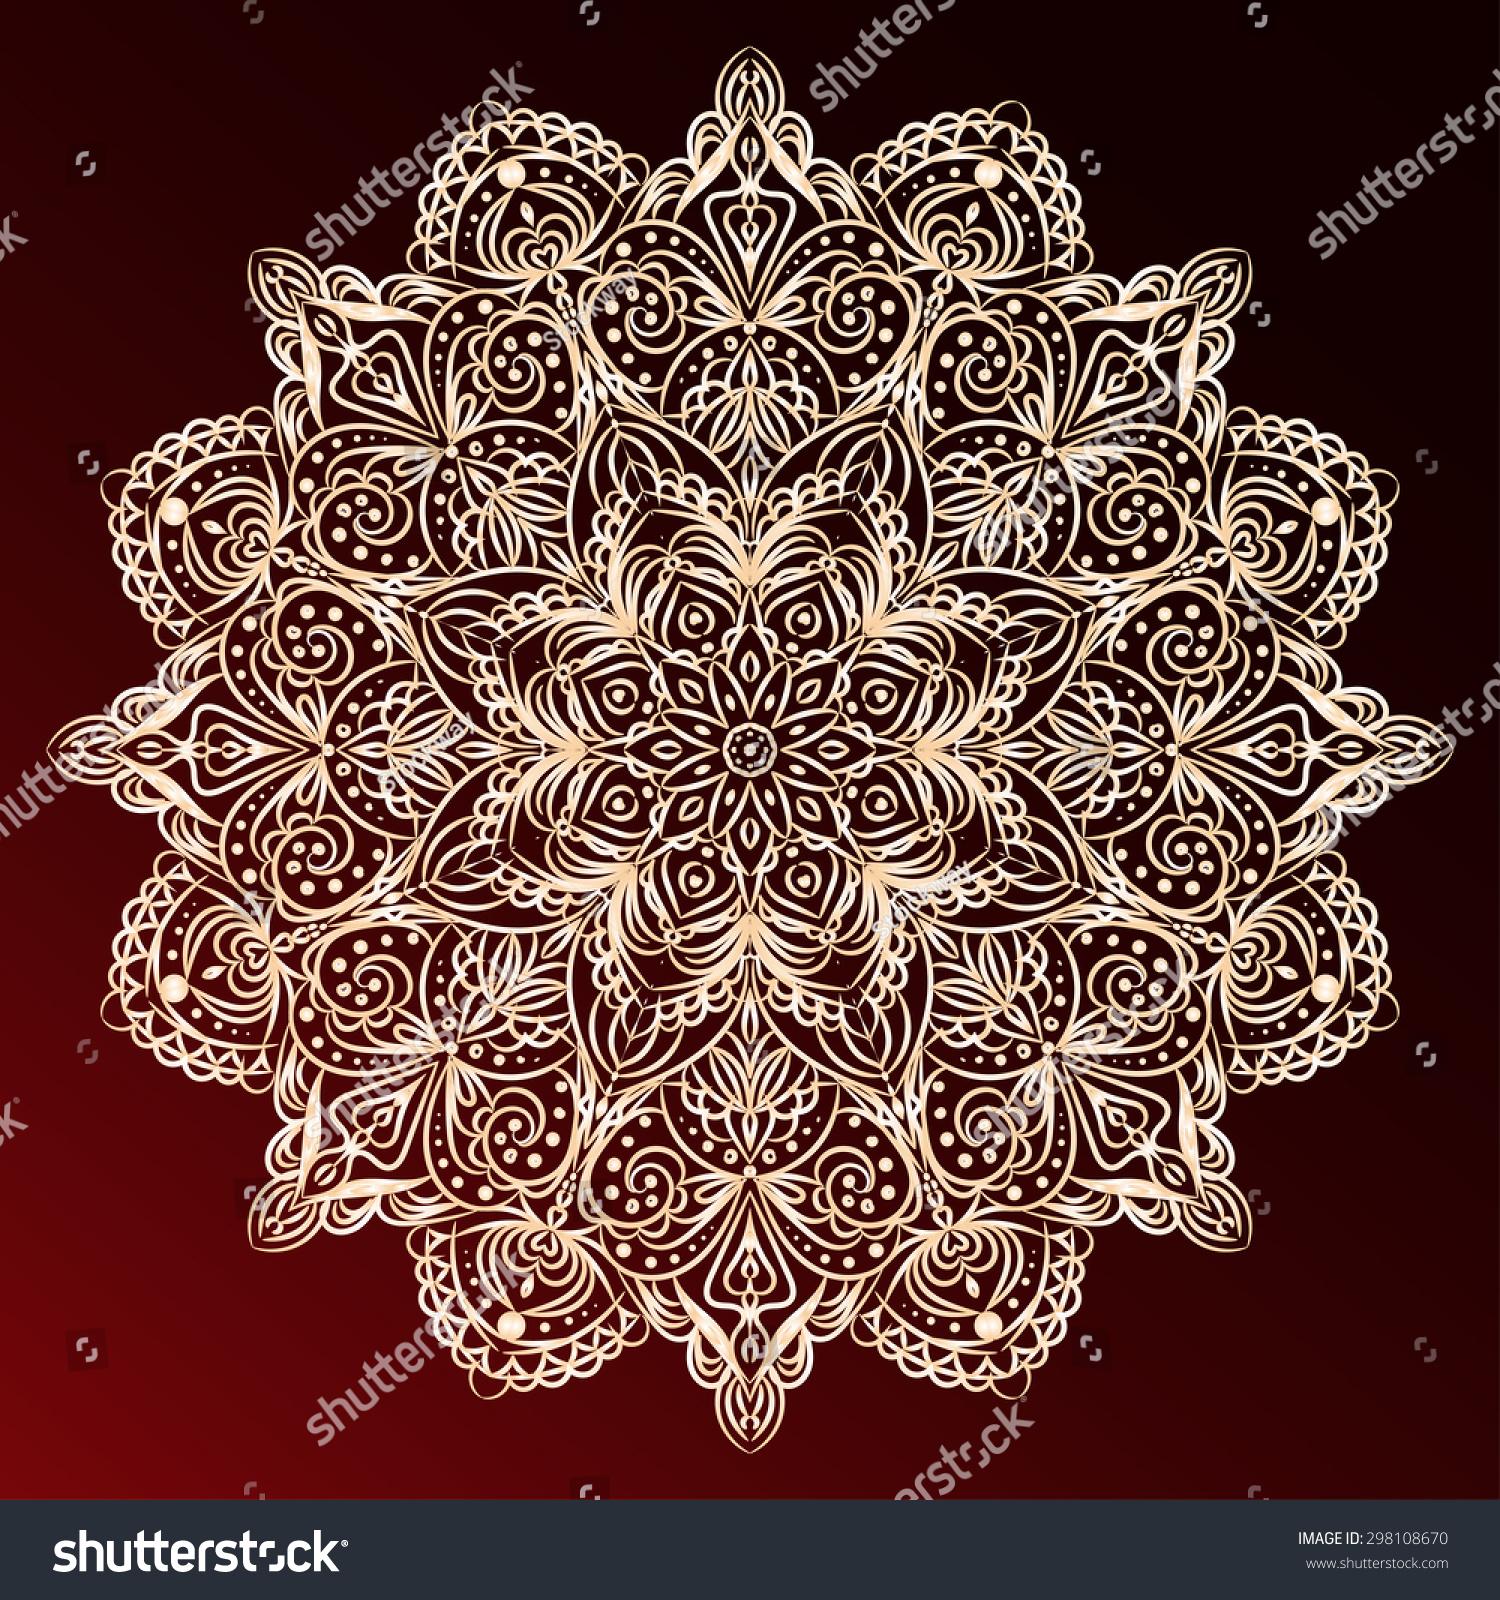 vector circular pattern mandala oriental motifs stock vector 298108670 shutterstock. Black Bedroom Furniture Sets. Home Design Ideas